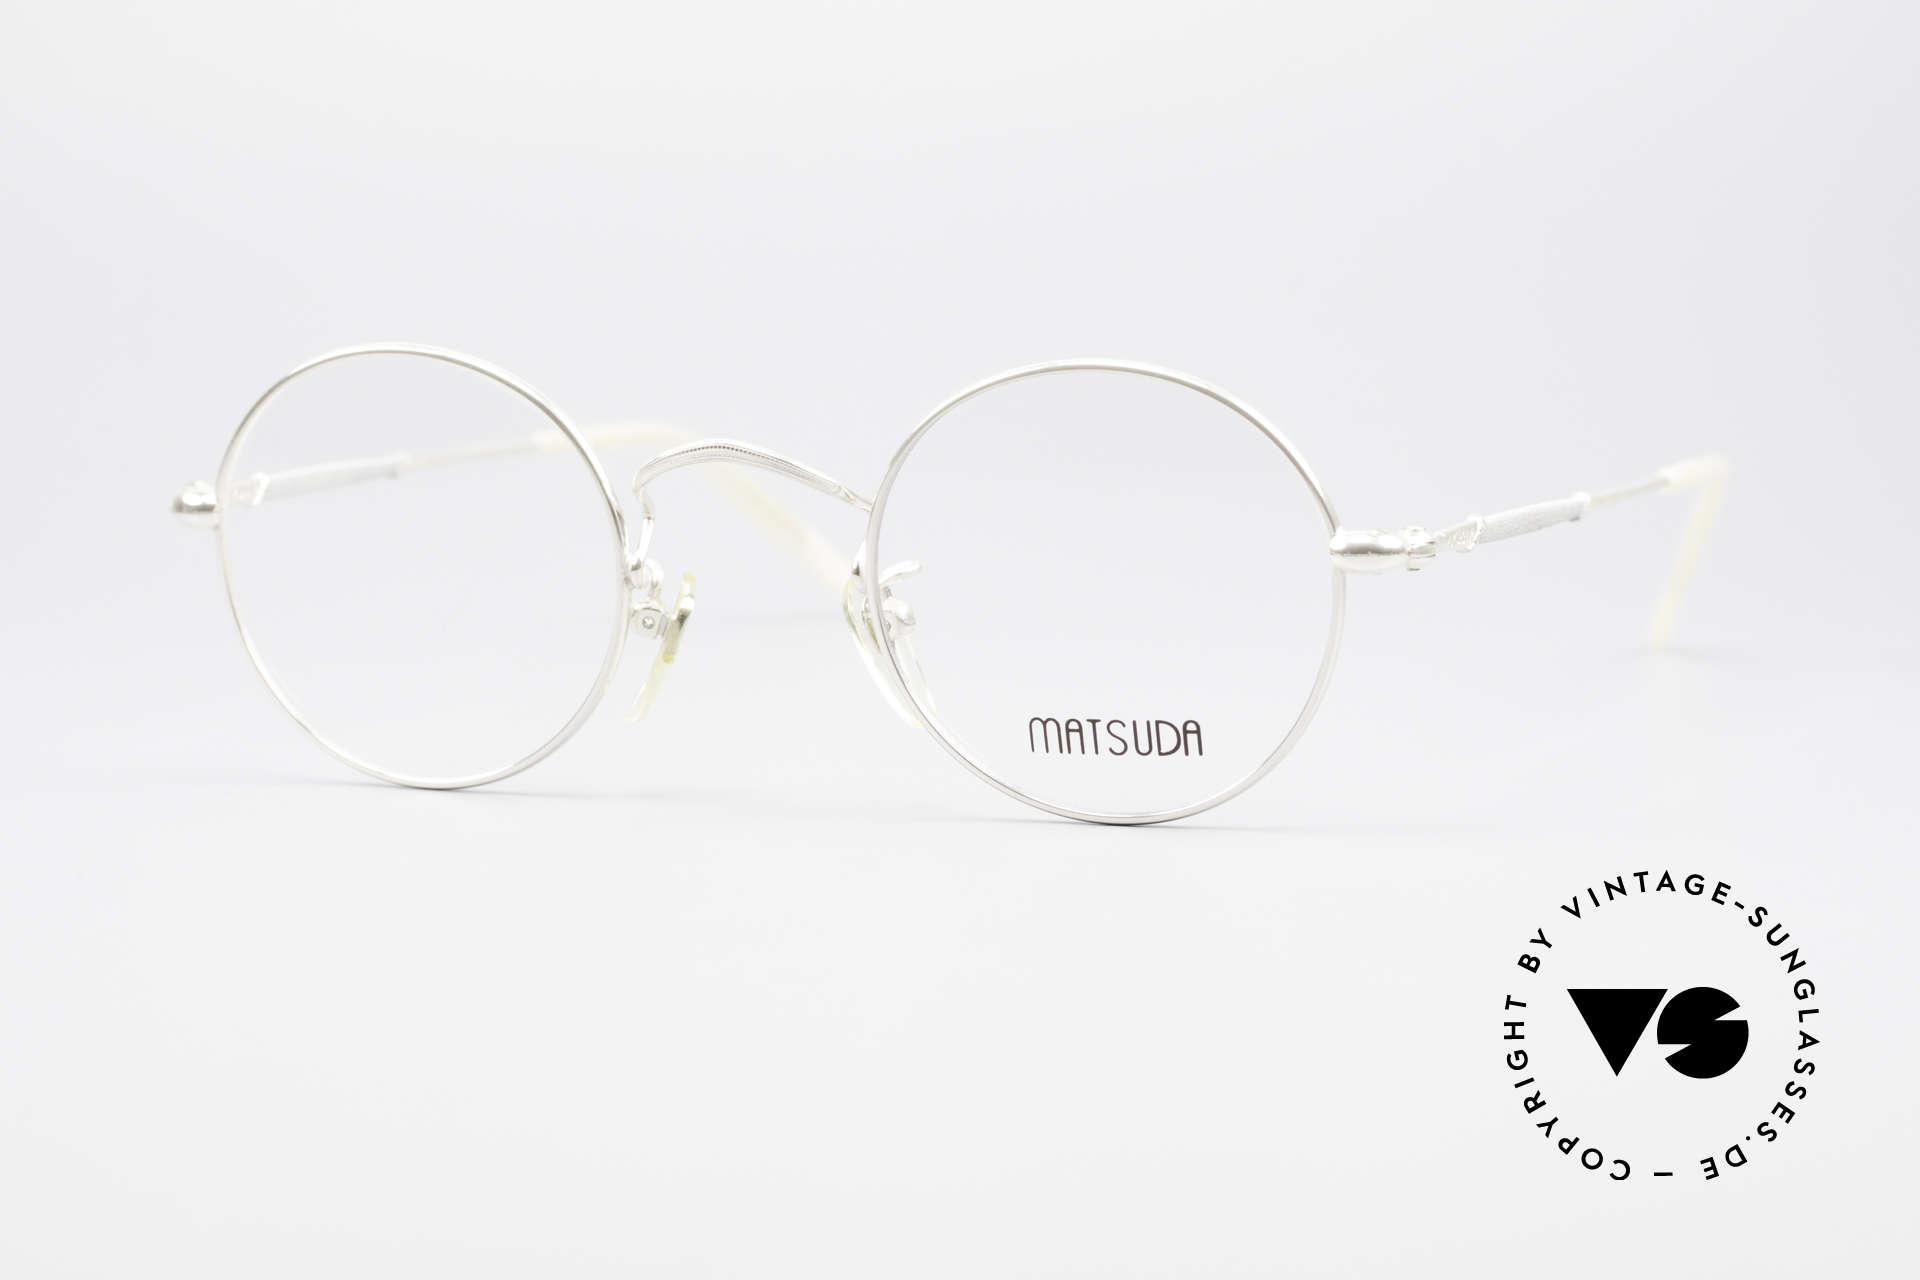 Matsuda 2872 Round 90's Designer Glasses, round vintage designer glasses by Matsuda from the 90's, Made for Men and Women